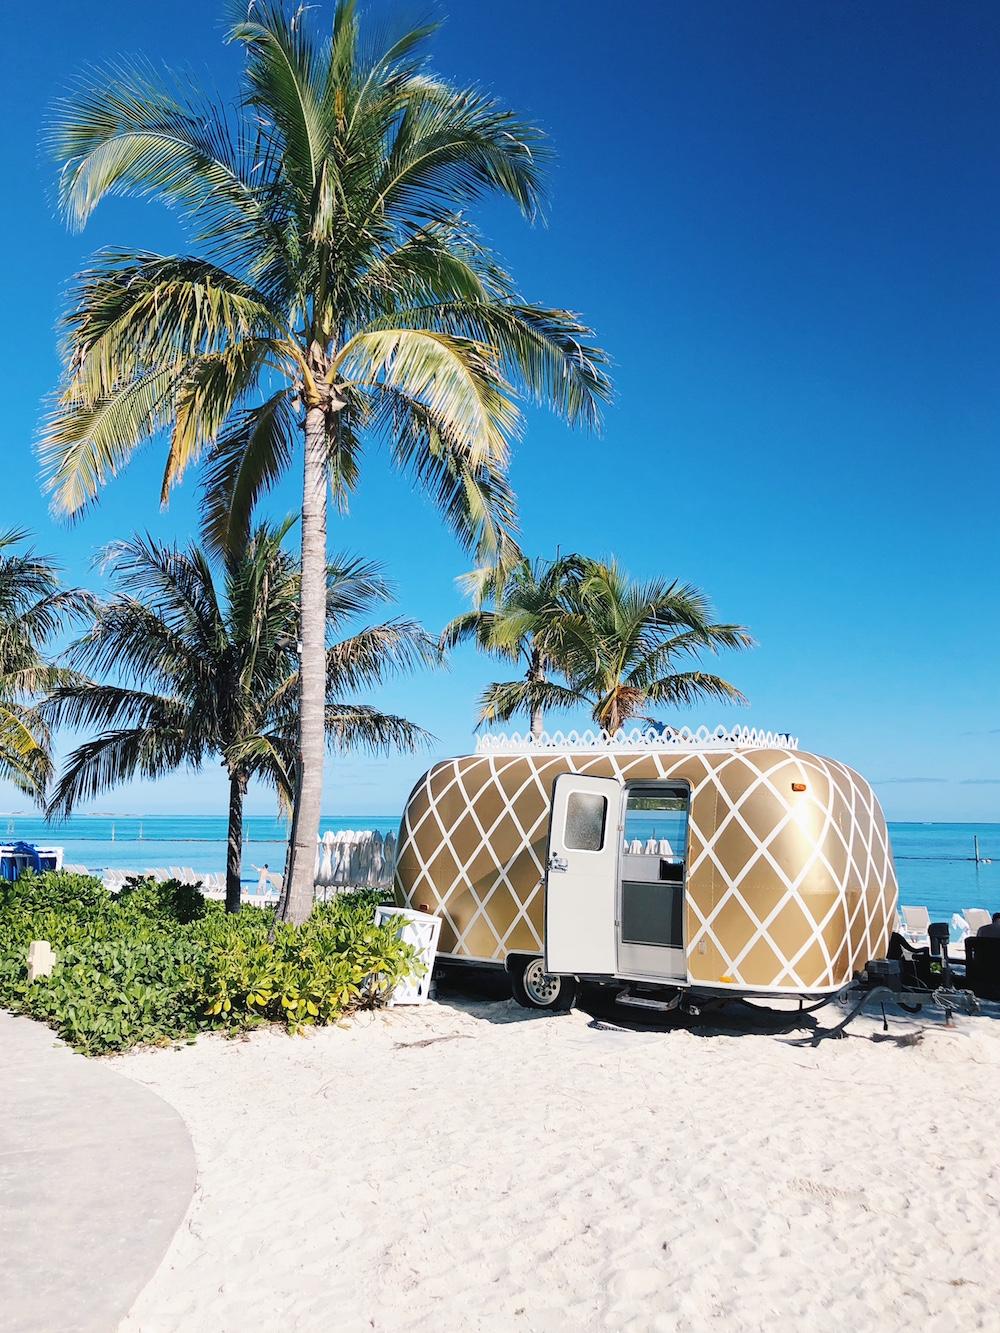 Gold white airstream pineapple print food truck on beach Grand Hyatt Baha Mar Bahamas